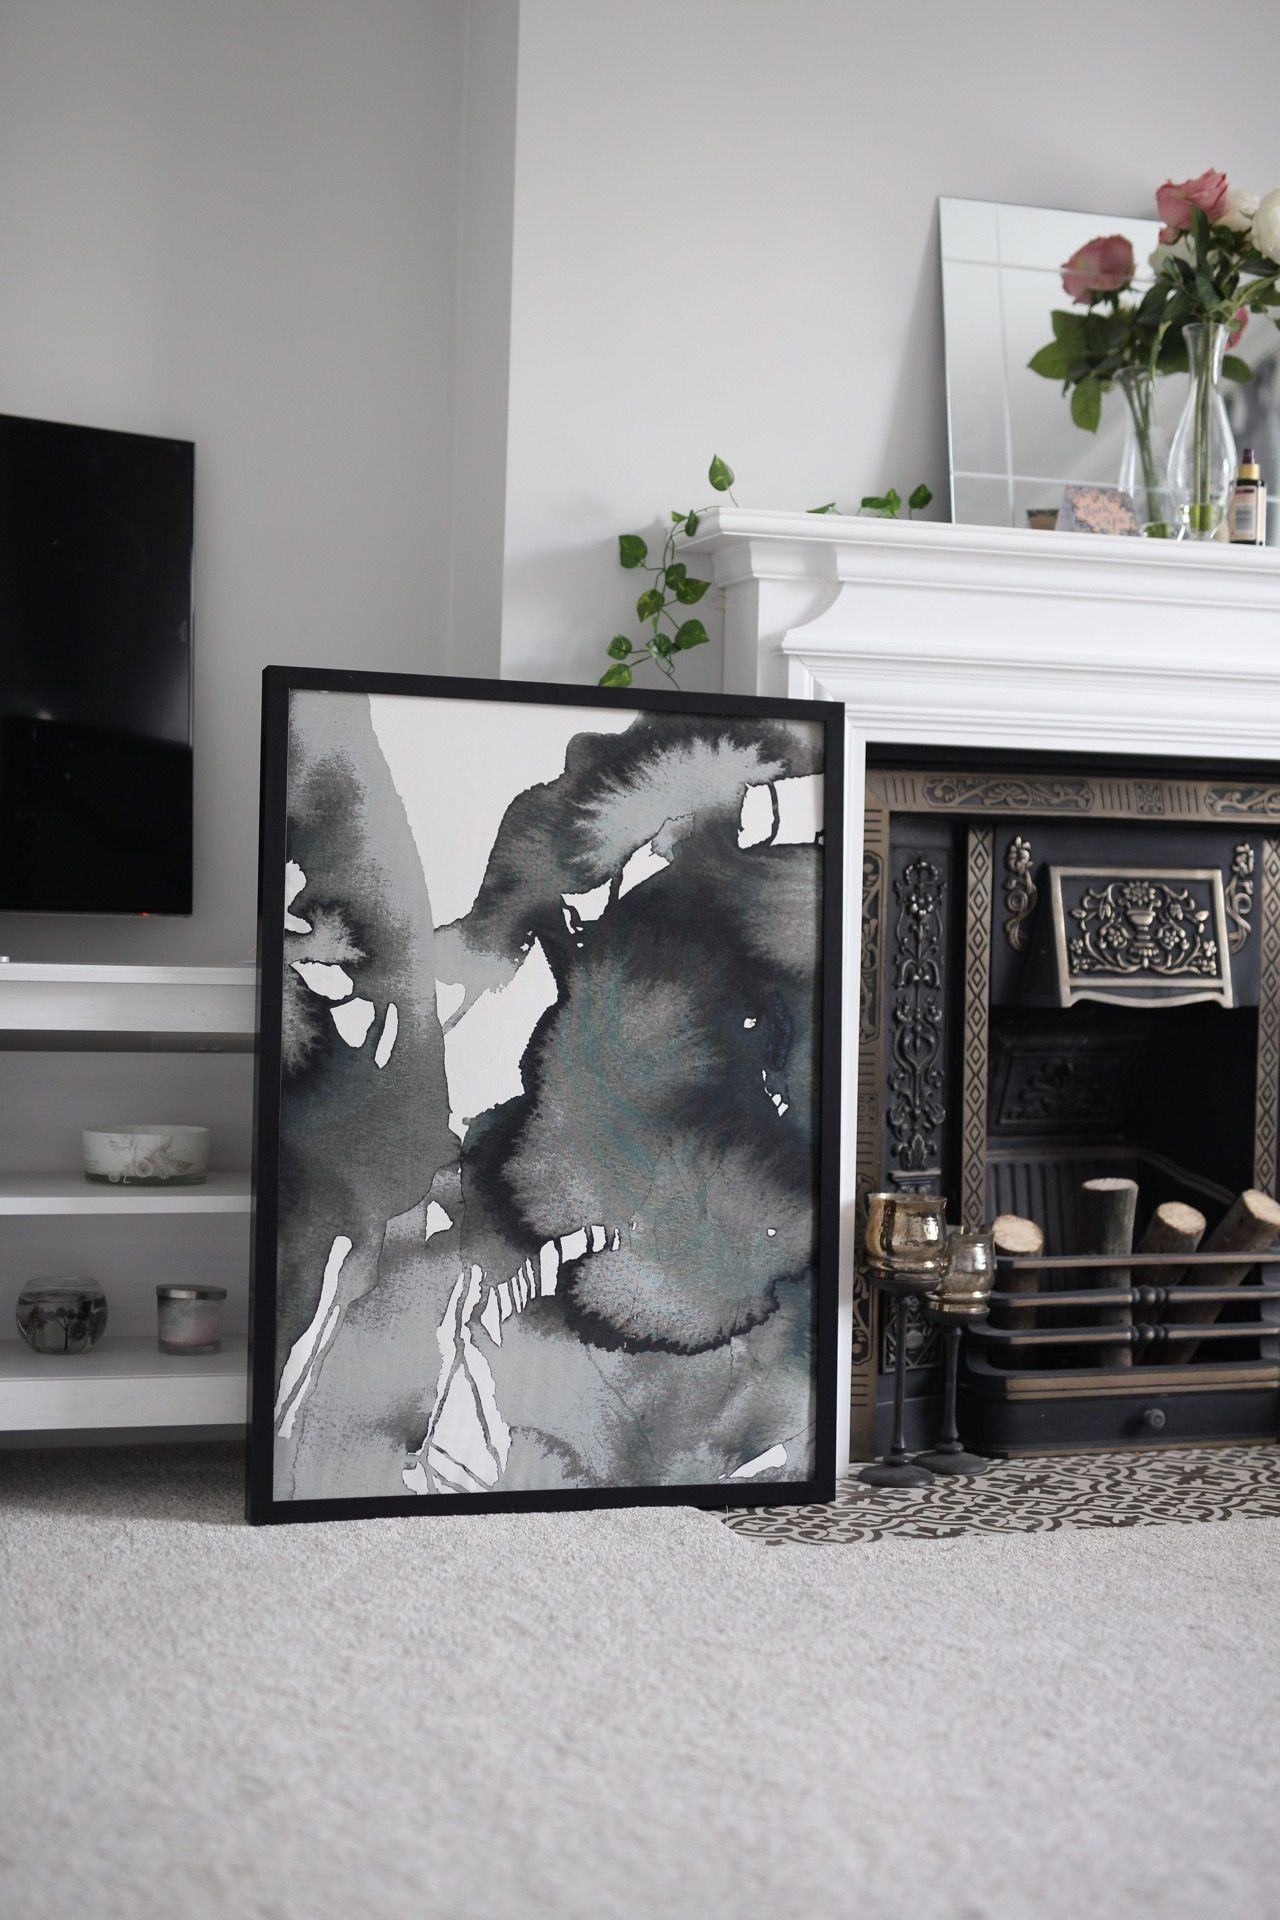 IKEA nattglim fabric diy wall art | gallery wall | Pinterest | Diy ...